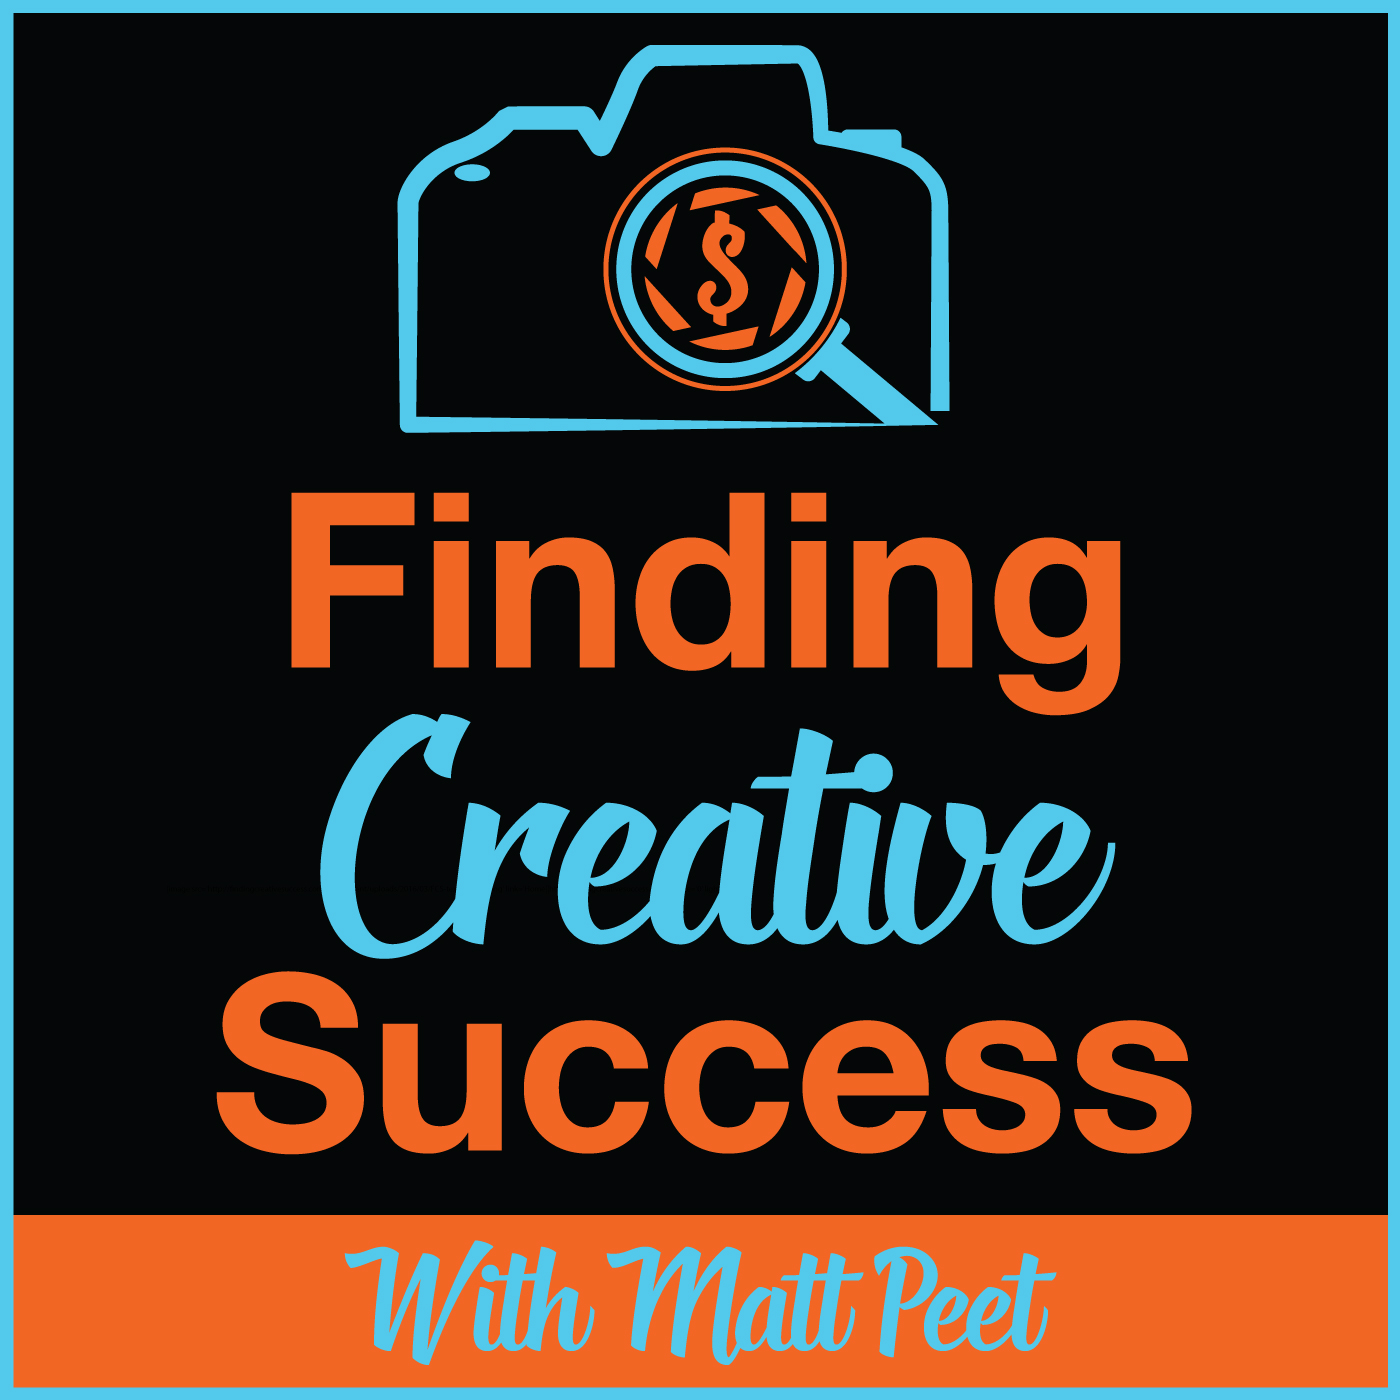 FCS 083: Brand genius - Pia Silva - teaches us how to build an amazing brand! show art